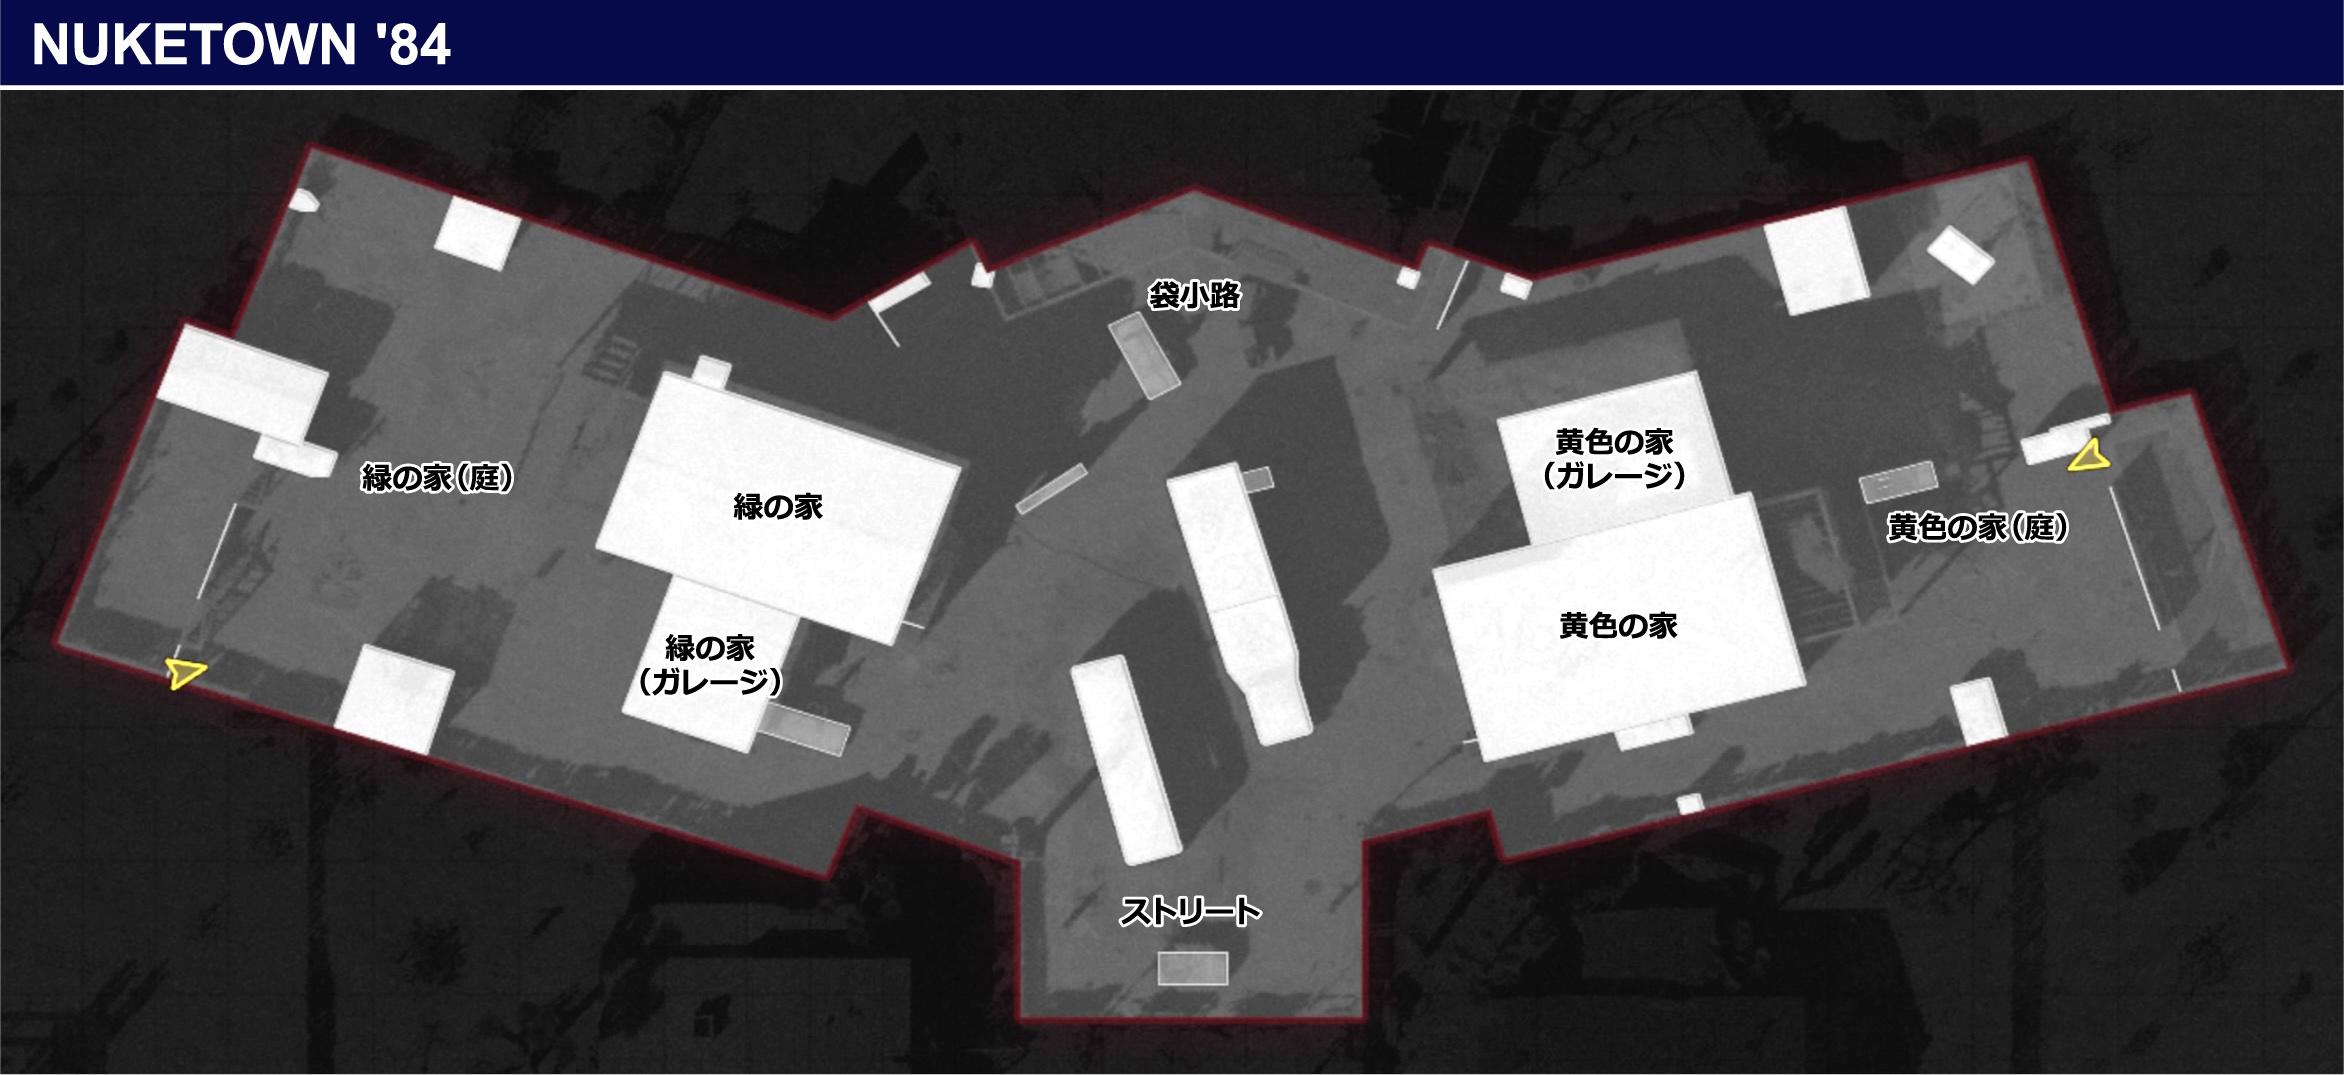 NUKETOWN-84-map